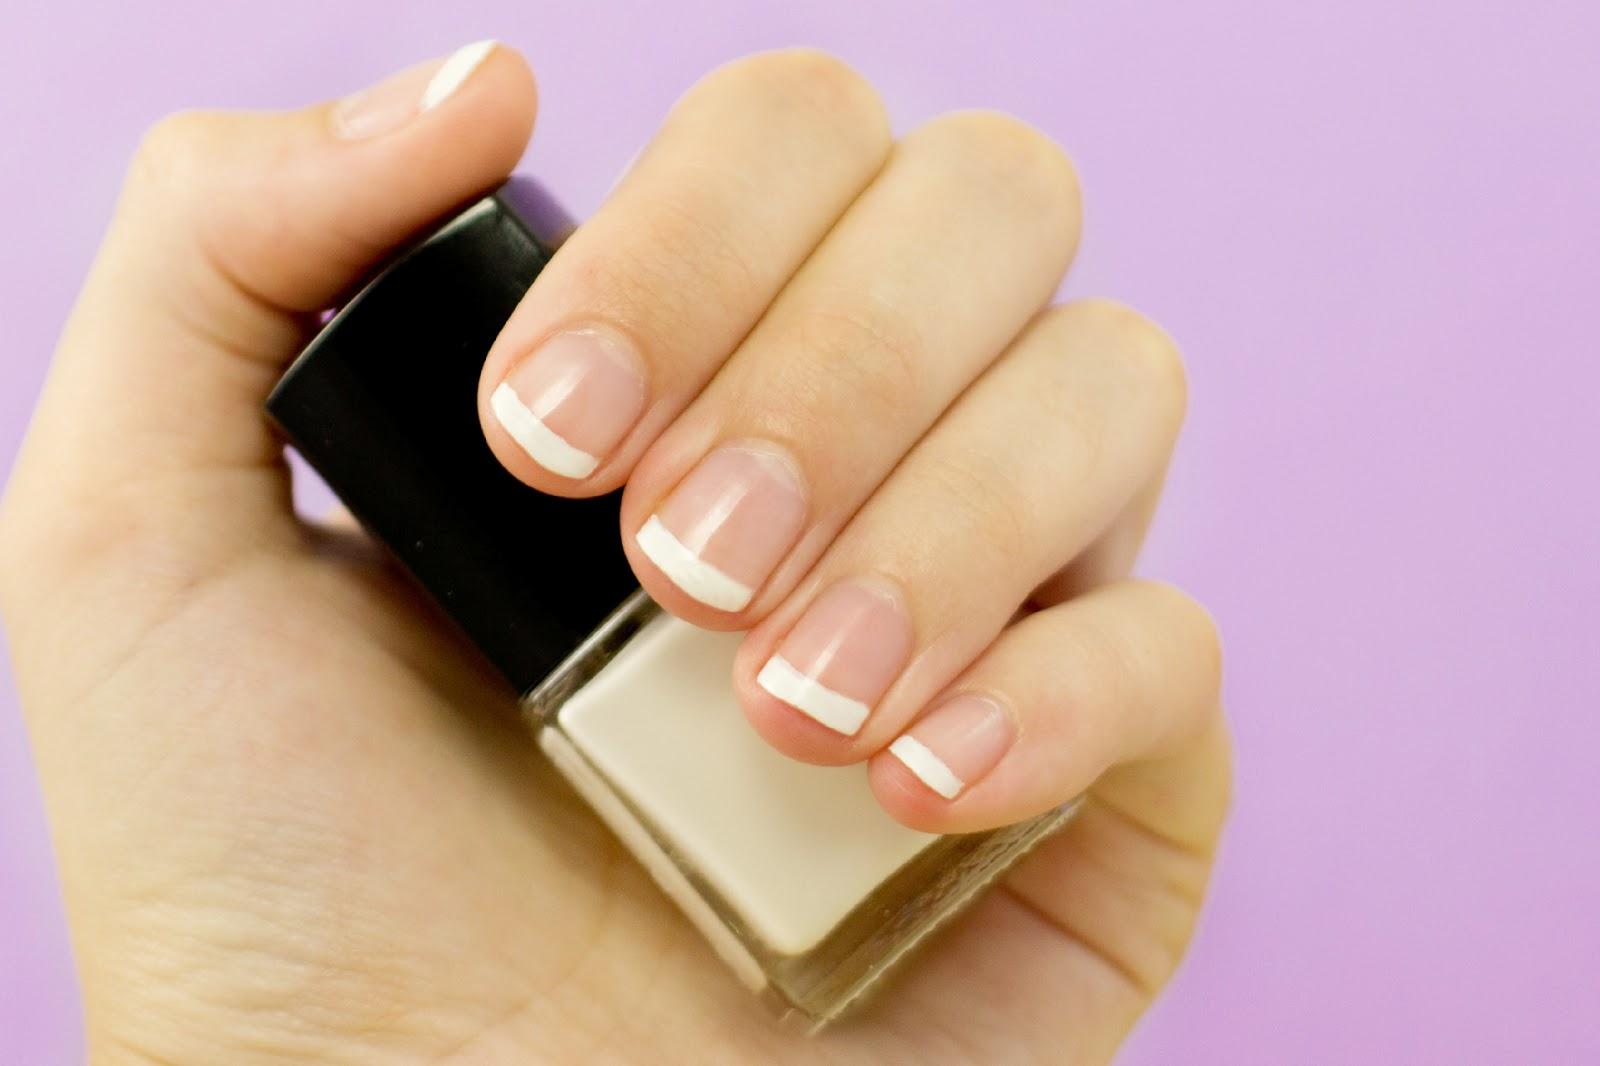 Маникюр на коротких ногтях для школы фото